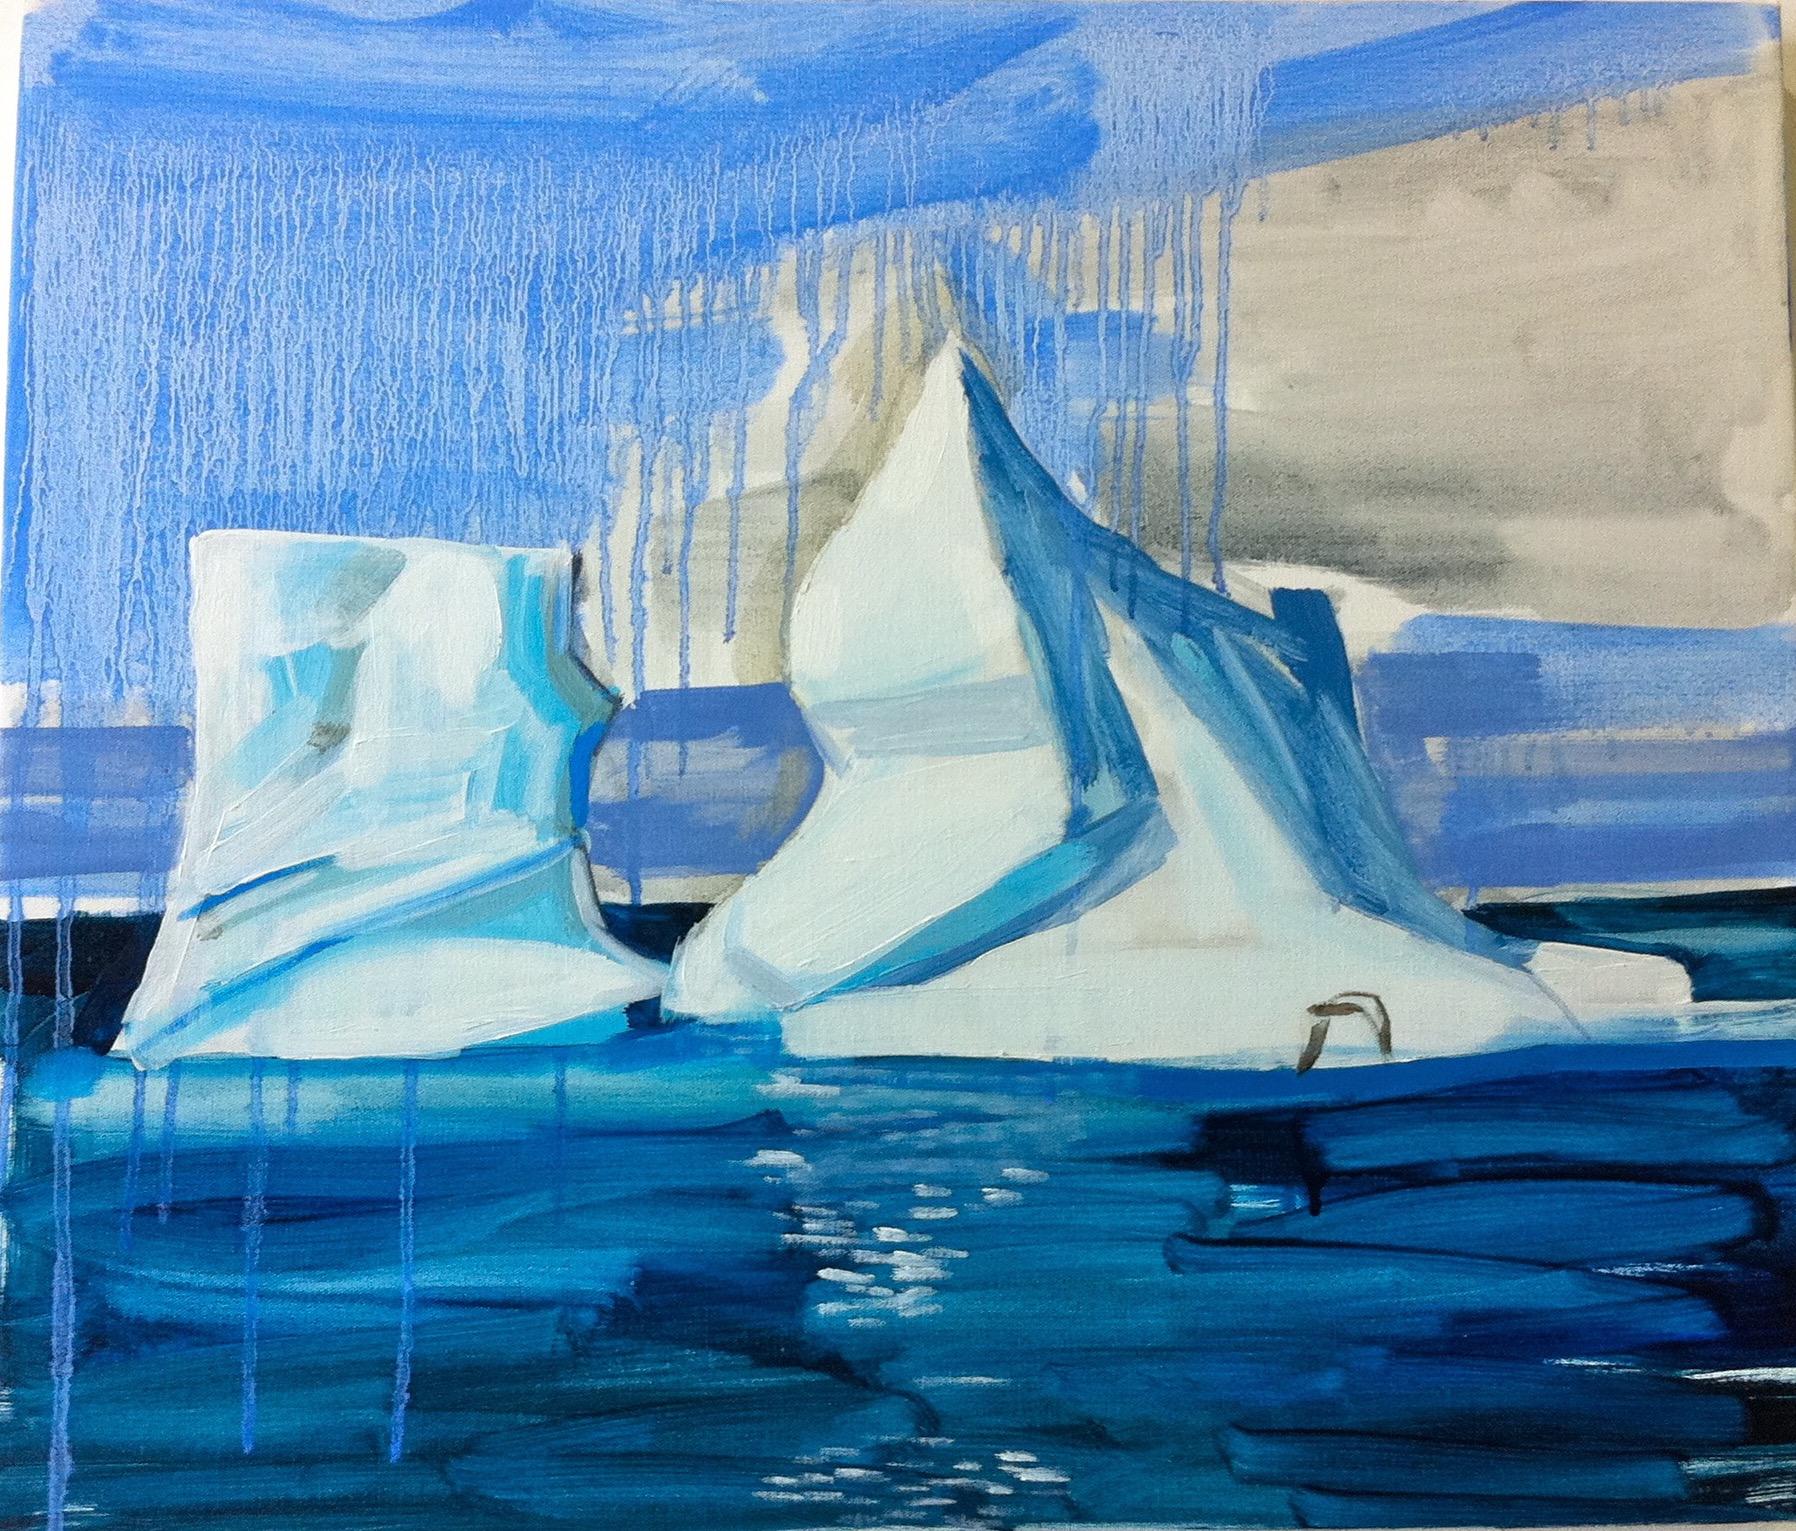 Arctic Circle 55 x 45cm oil on canvas 2013